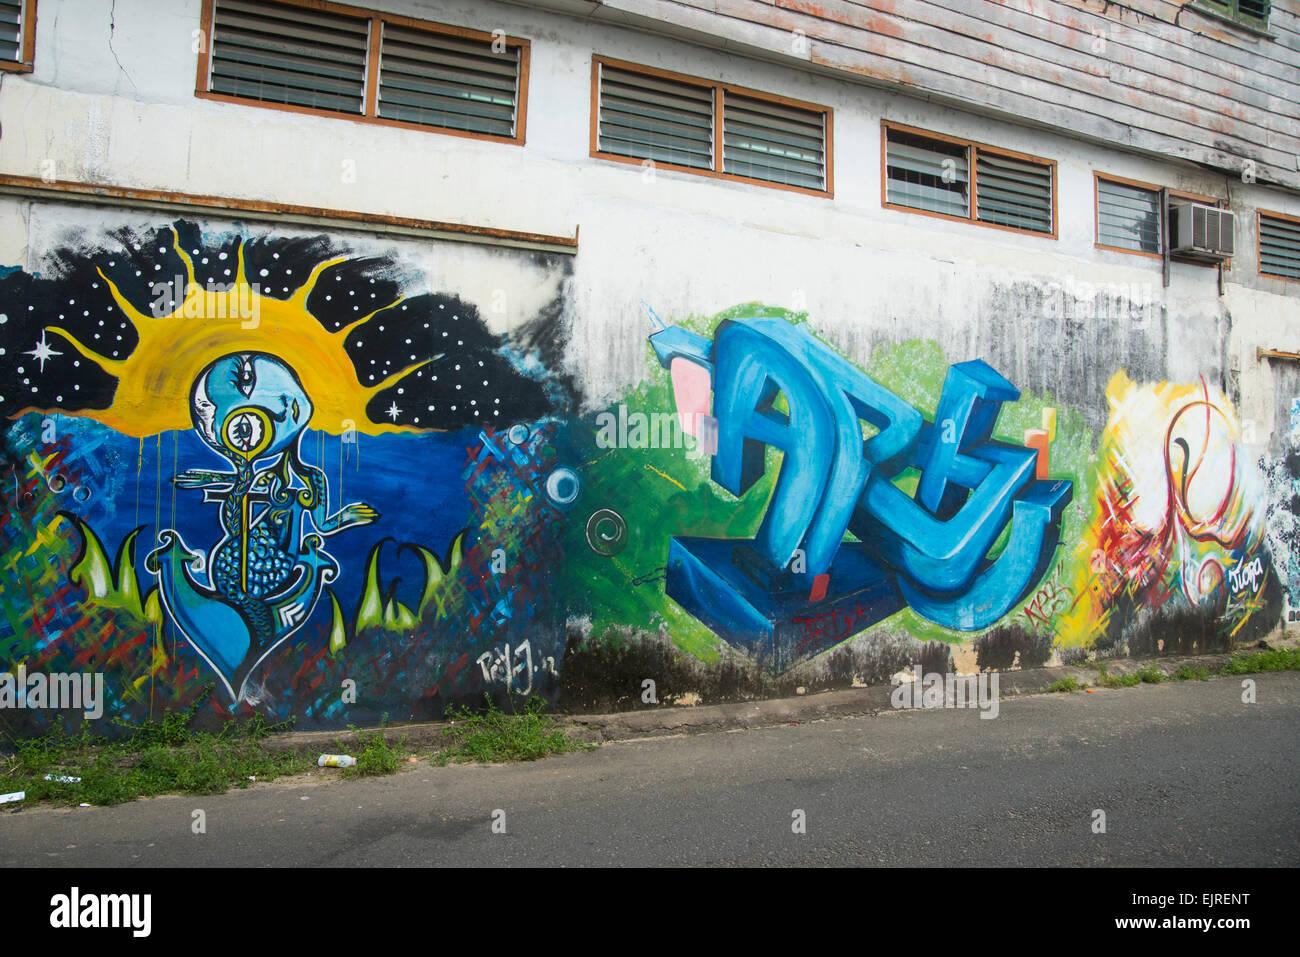 Mural, Paramaribo, Suriname - Stock Image